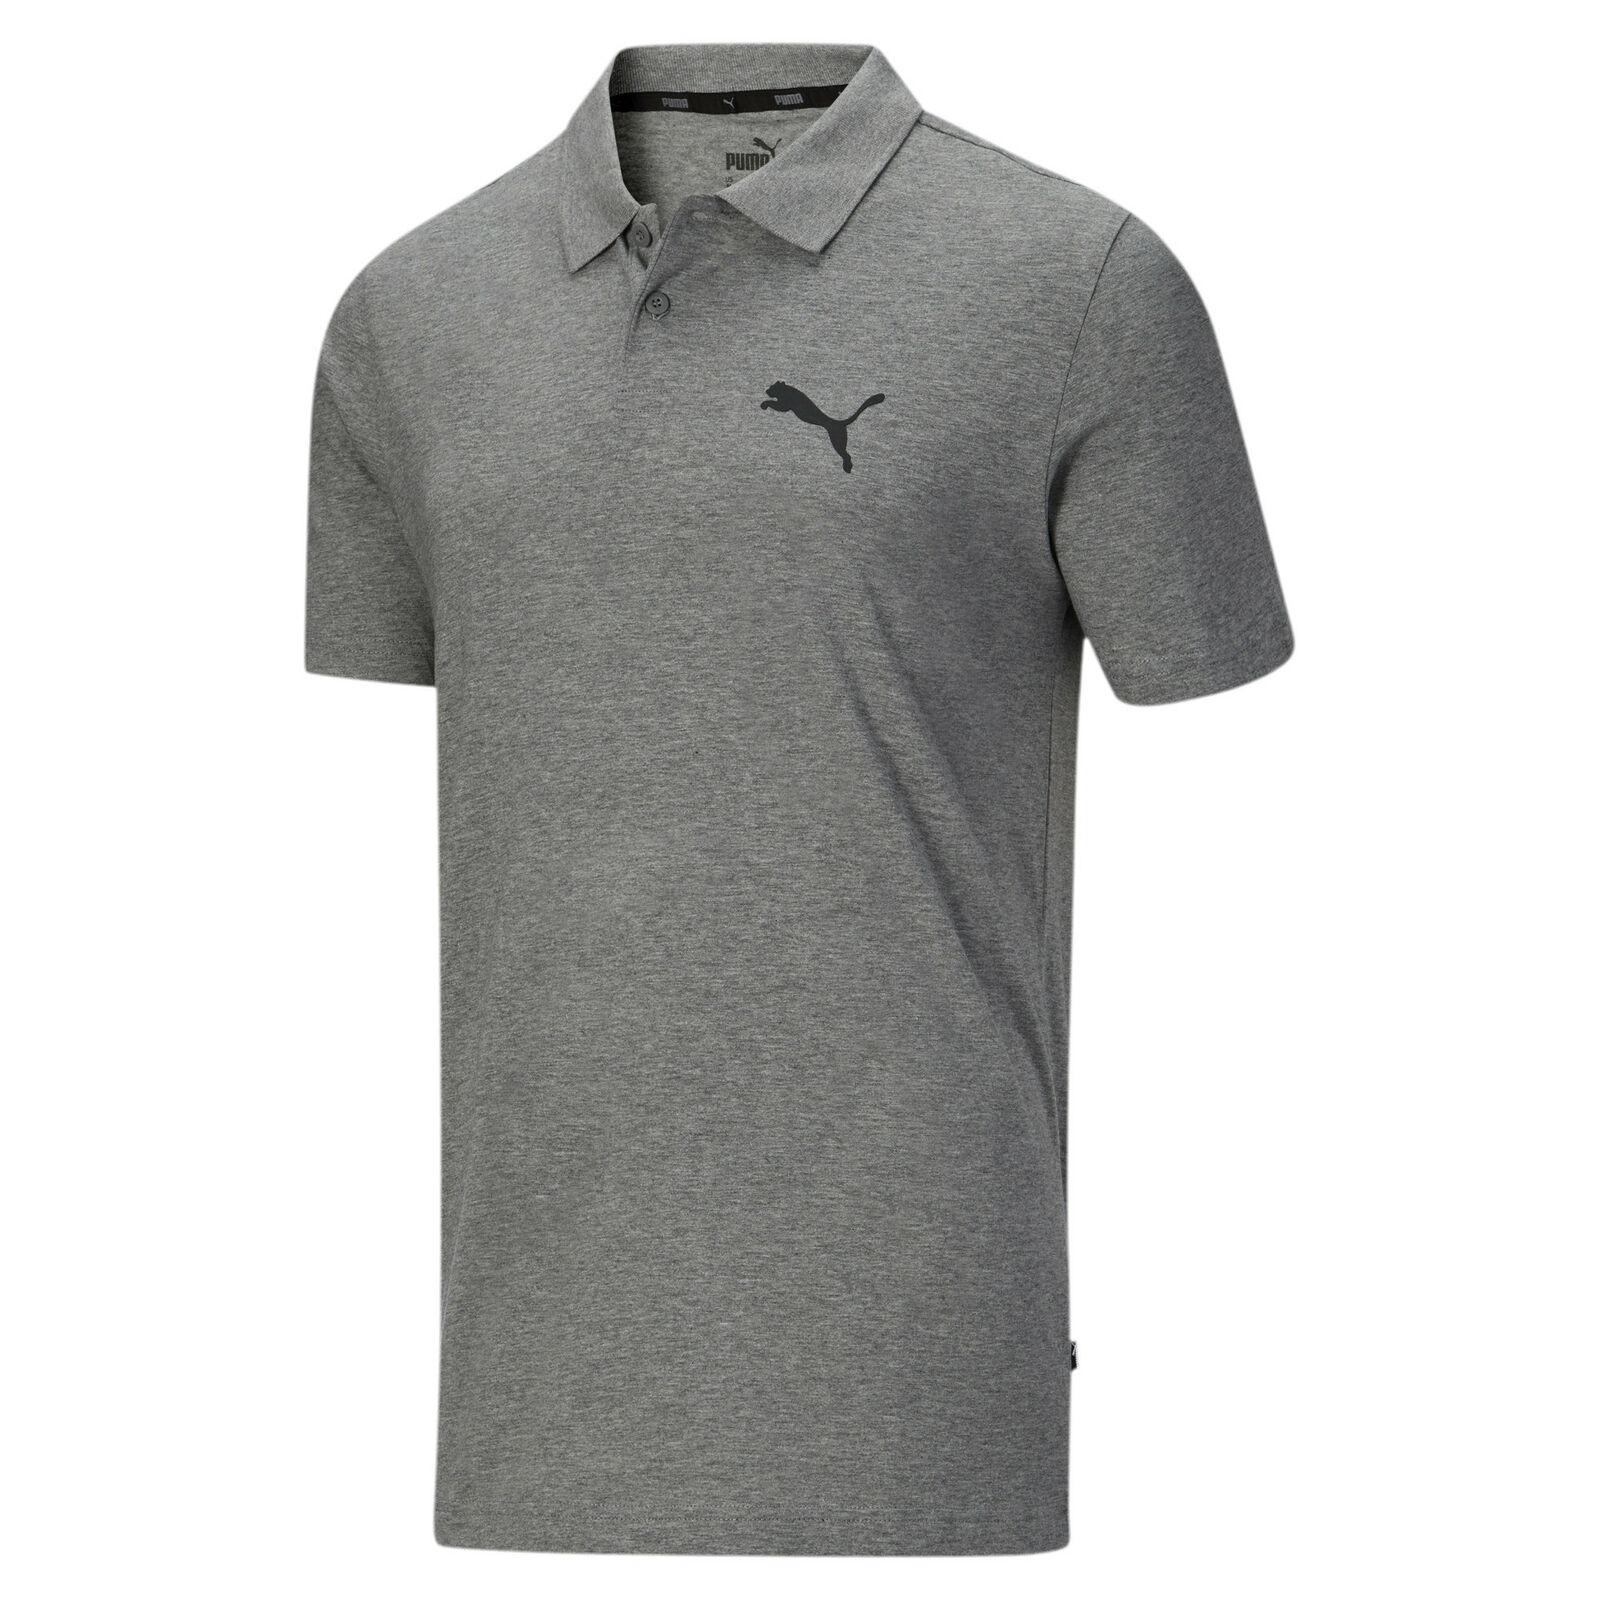 Image 111 - PUMA-Men-039-s-Essentials-Jersey-Polo